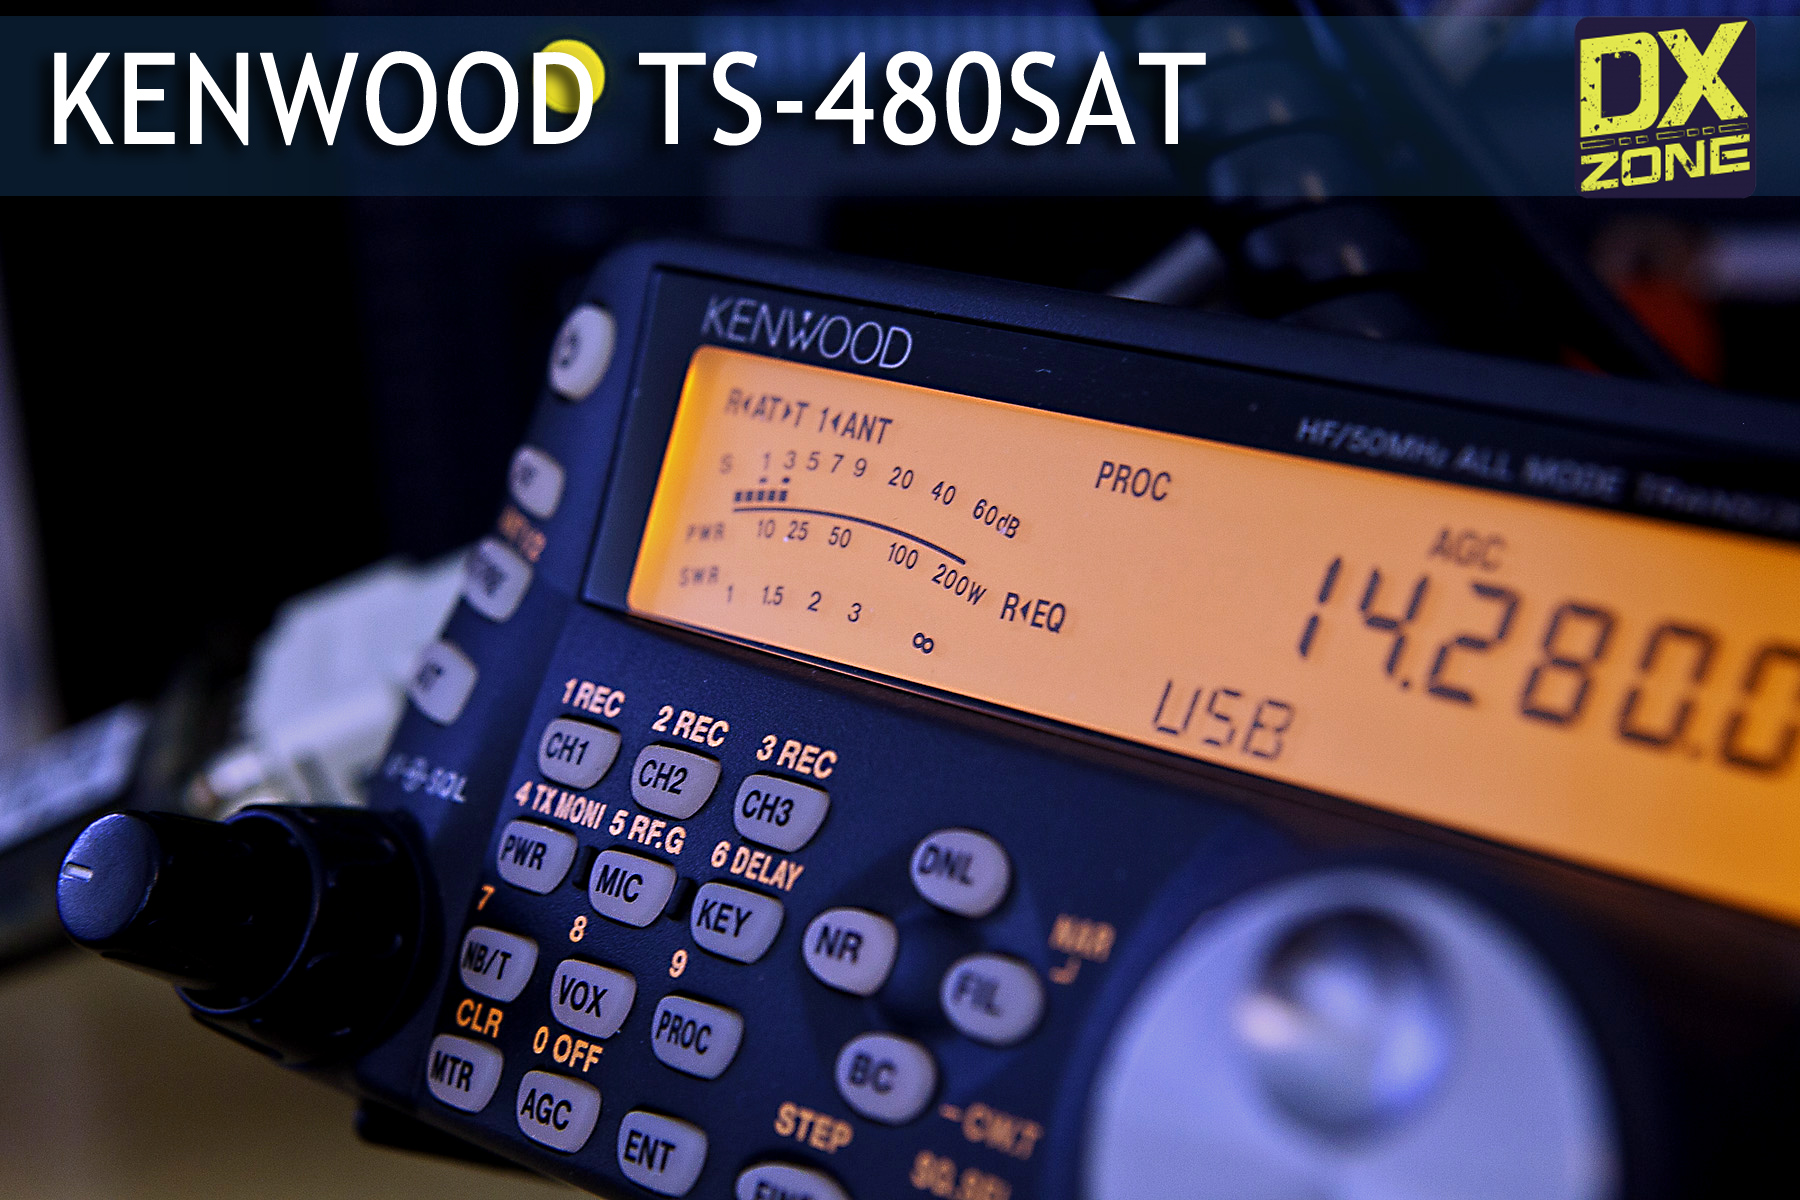 Kenwood TS-480 : Kenwood TS-480 Links - The DXZone com